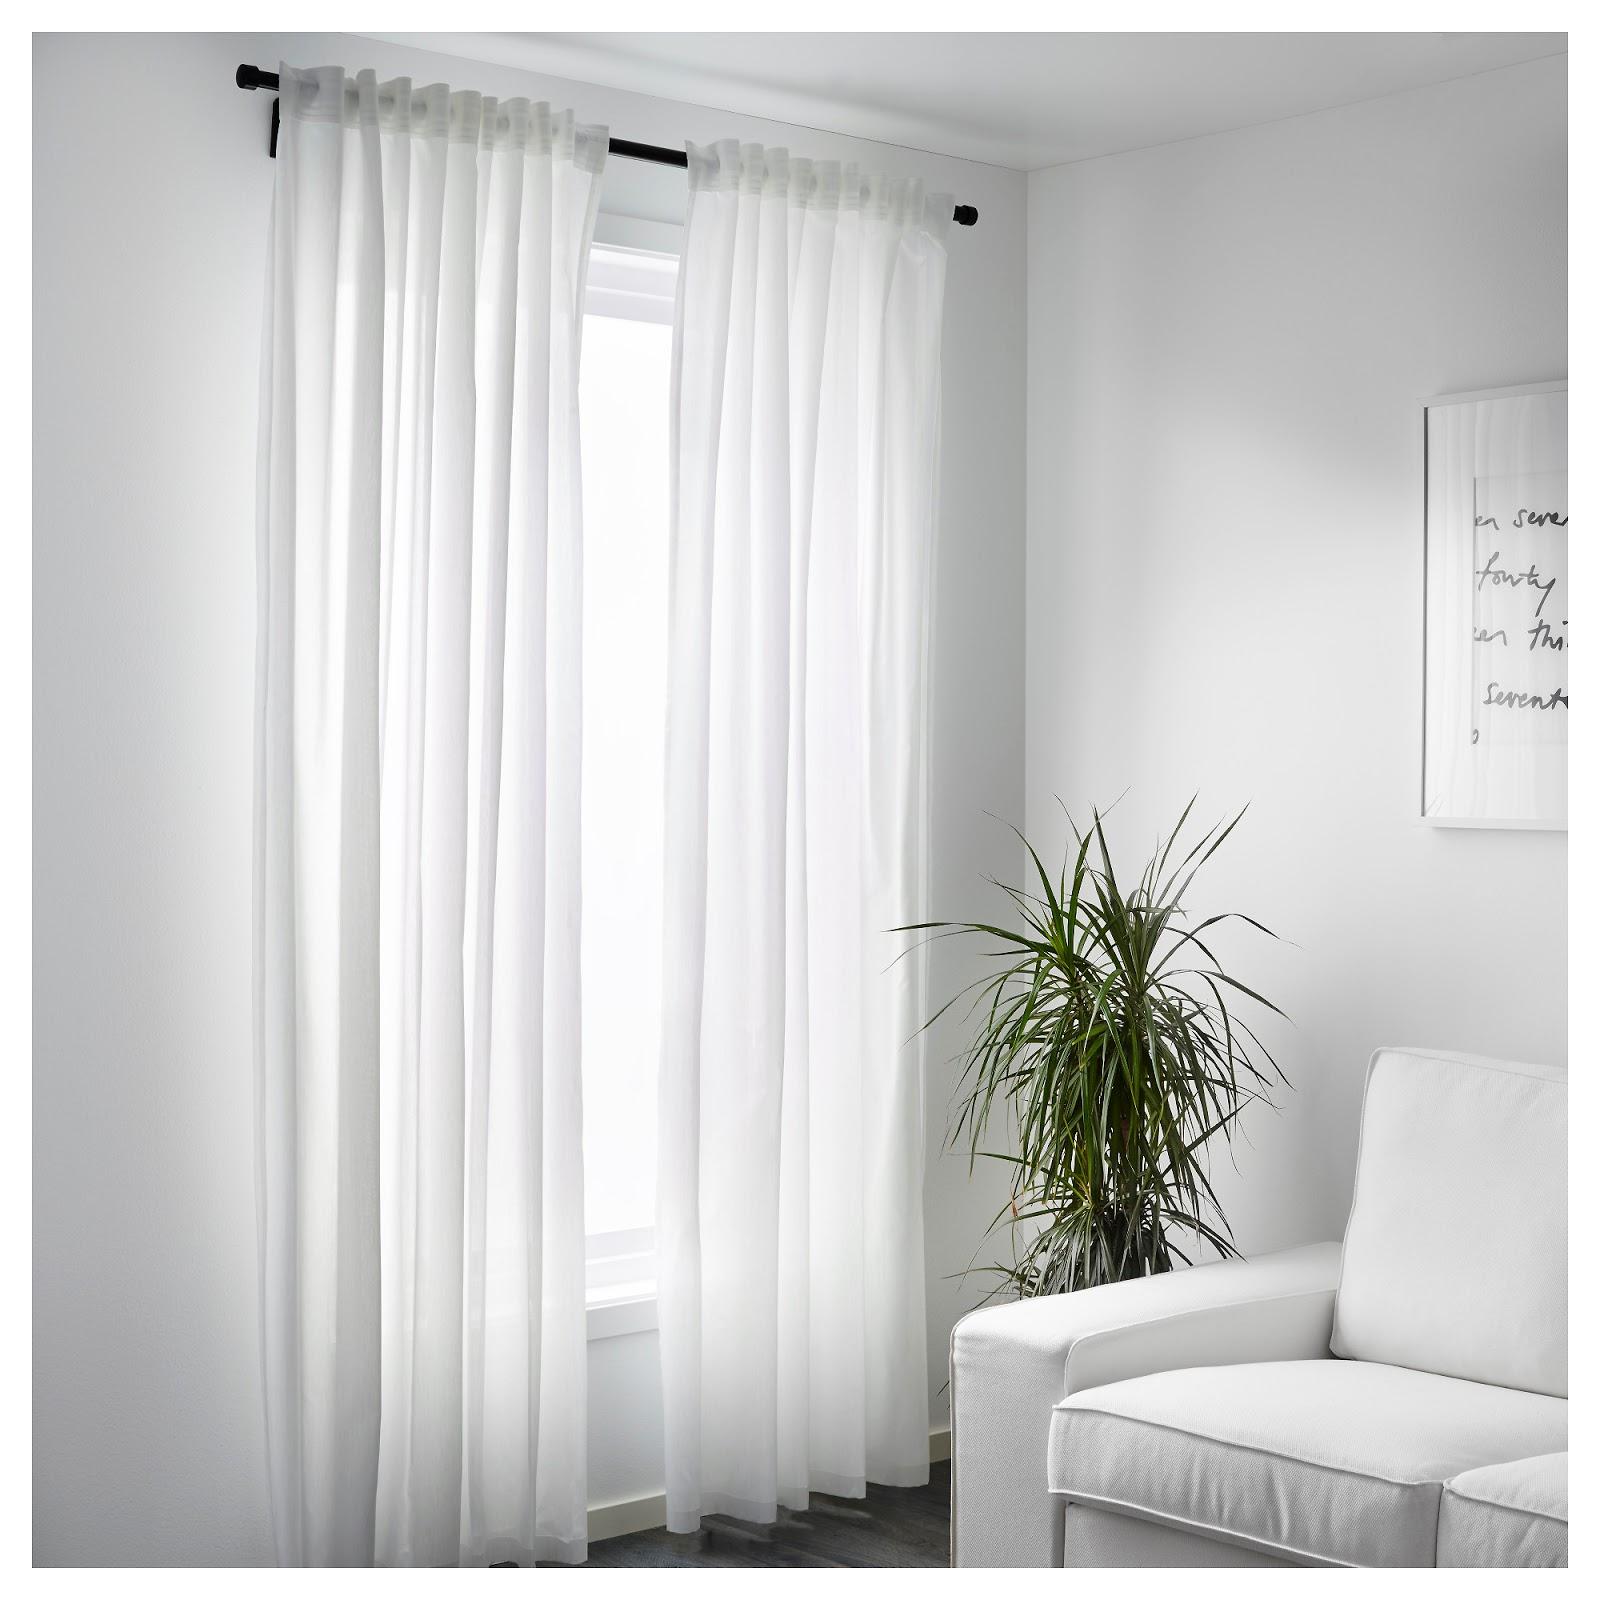 Big Striped Curtains Window Curtain Ideas Billy Hill Bimini Top Side Bishop Sleeve